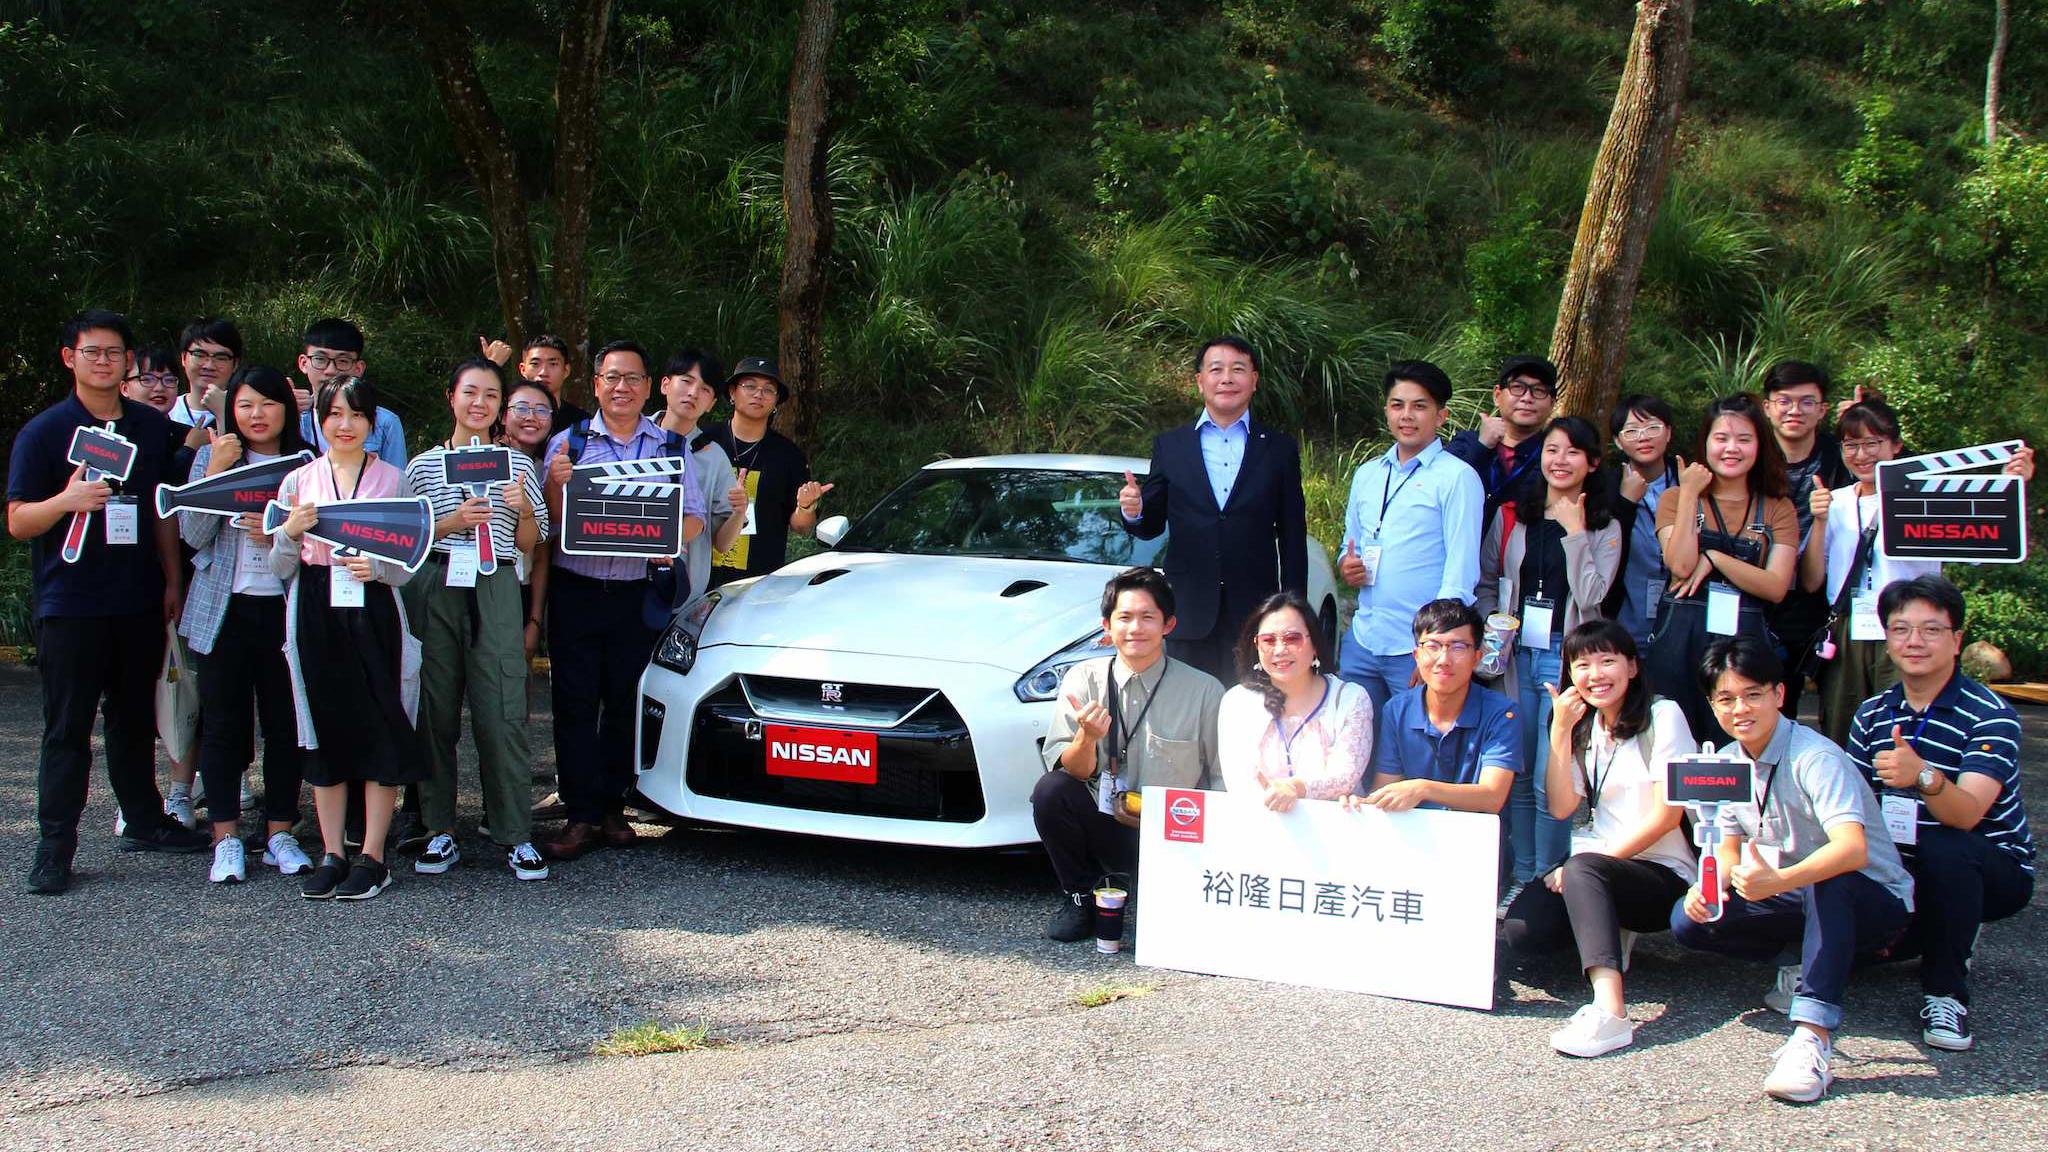 Nissan Leaf for Change 決選團隊參訪裕隆日產,GT-R 試乘與 Workshop 激發靈感